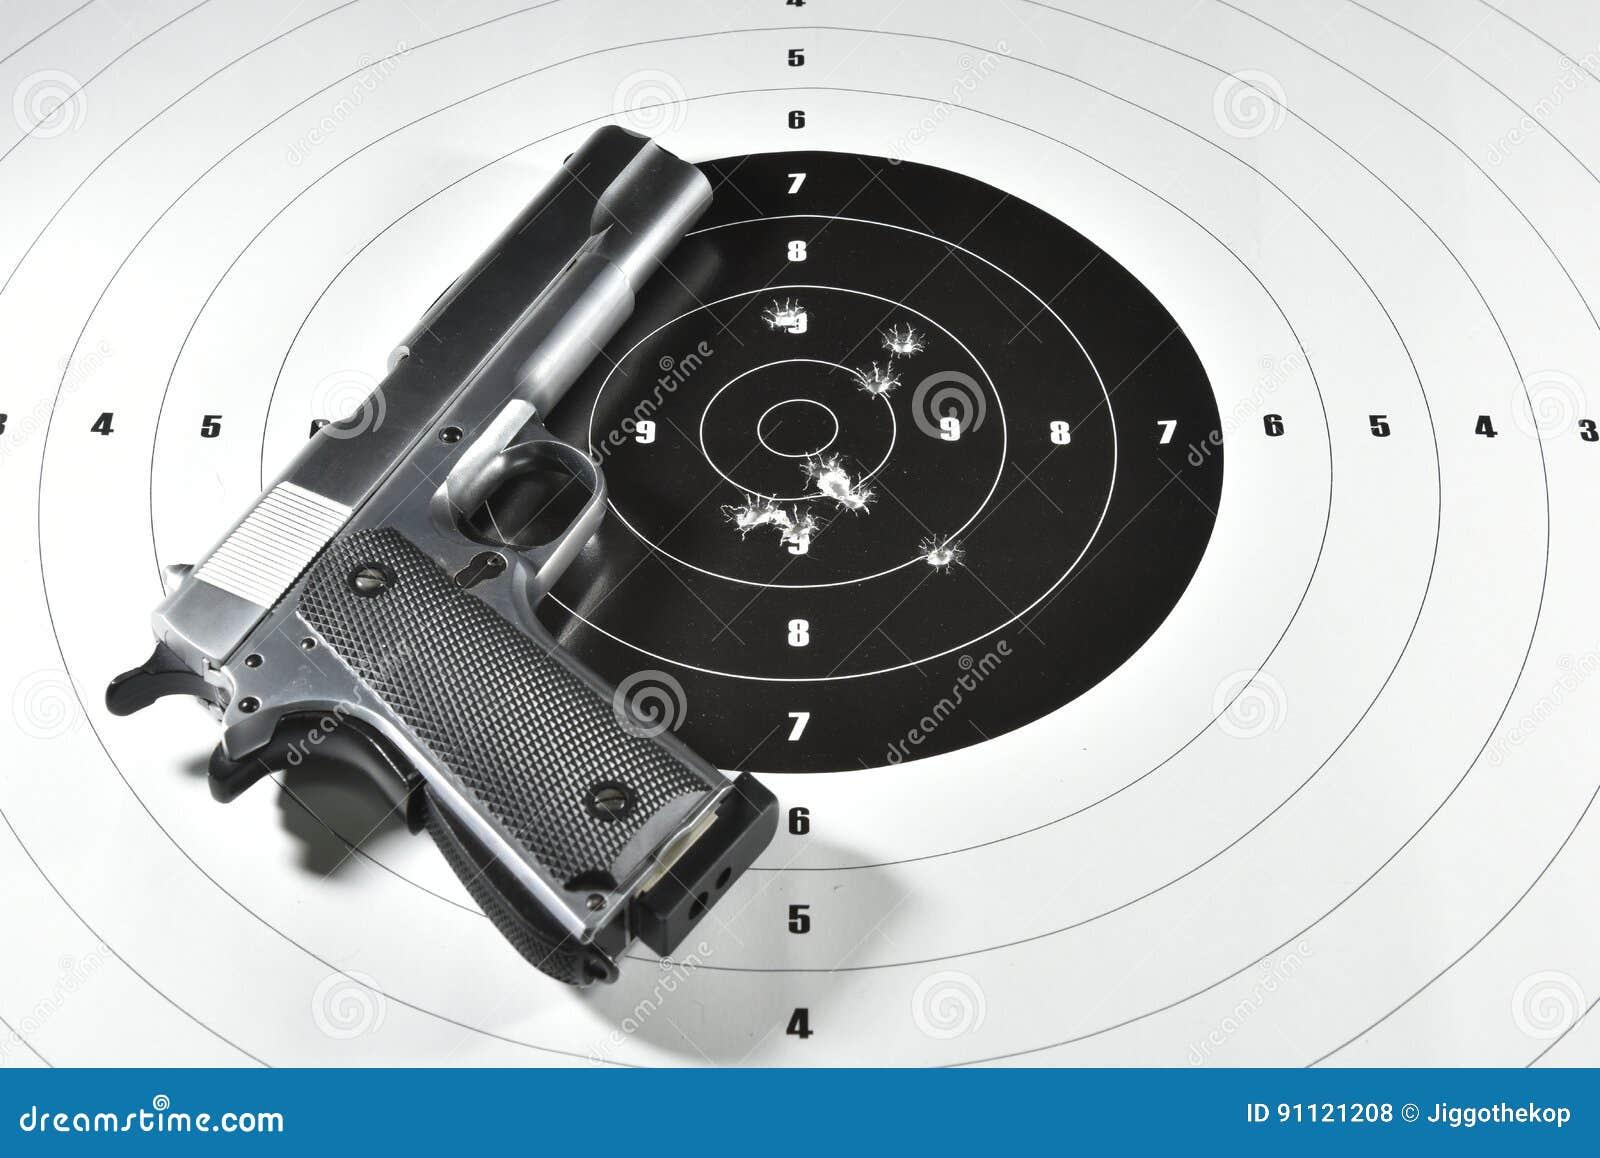 Handgun And Shooting Target Stock Photo - Image of military